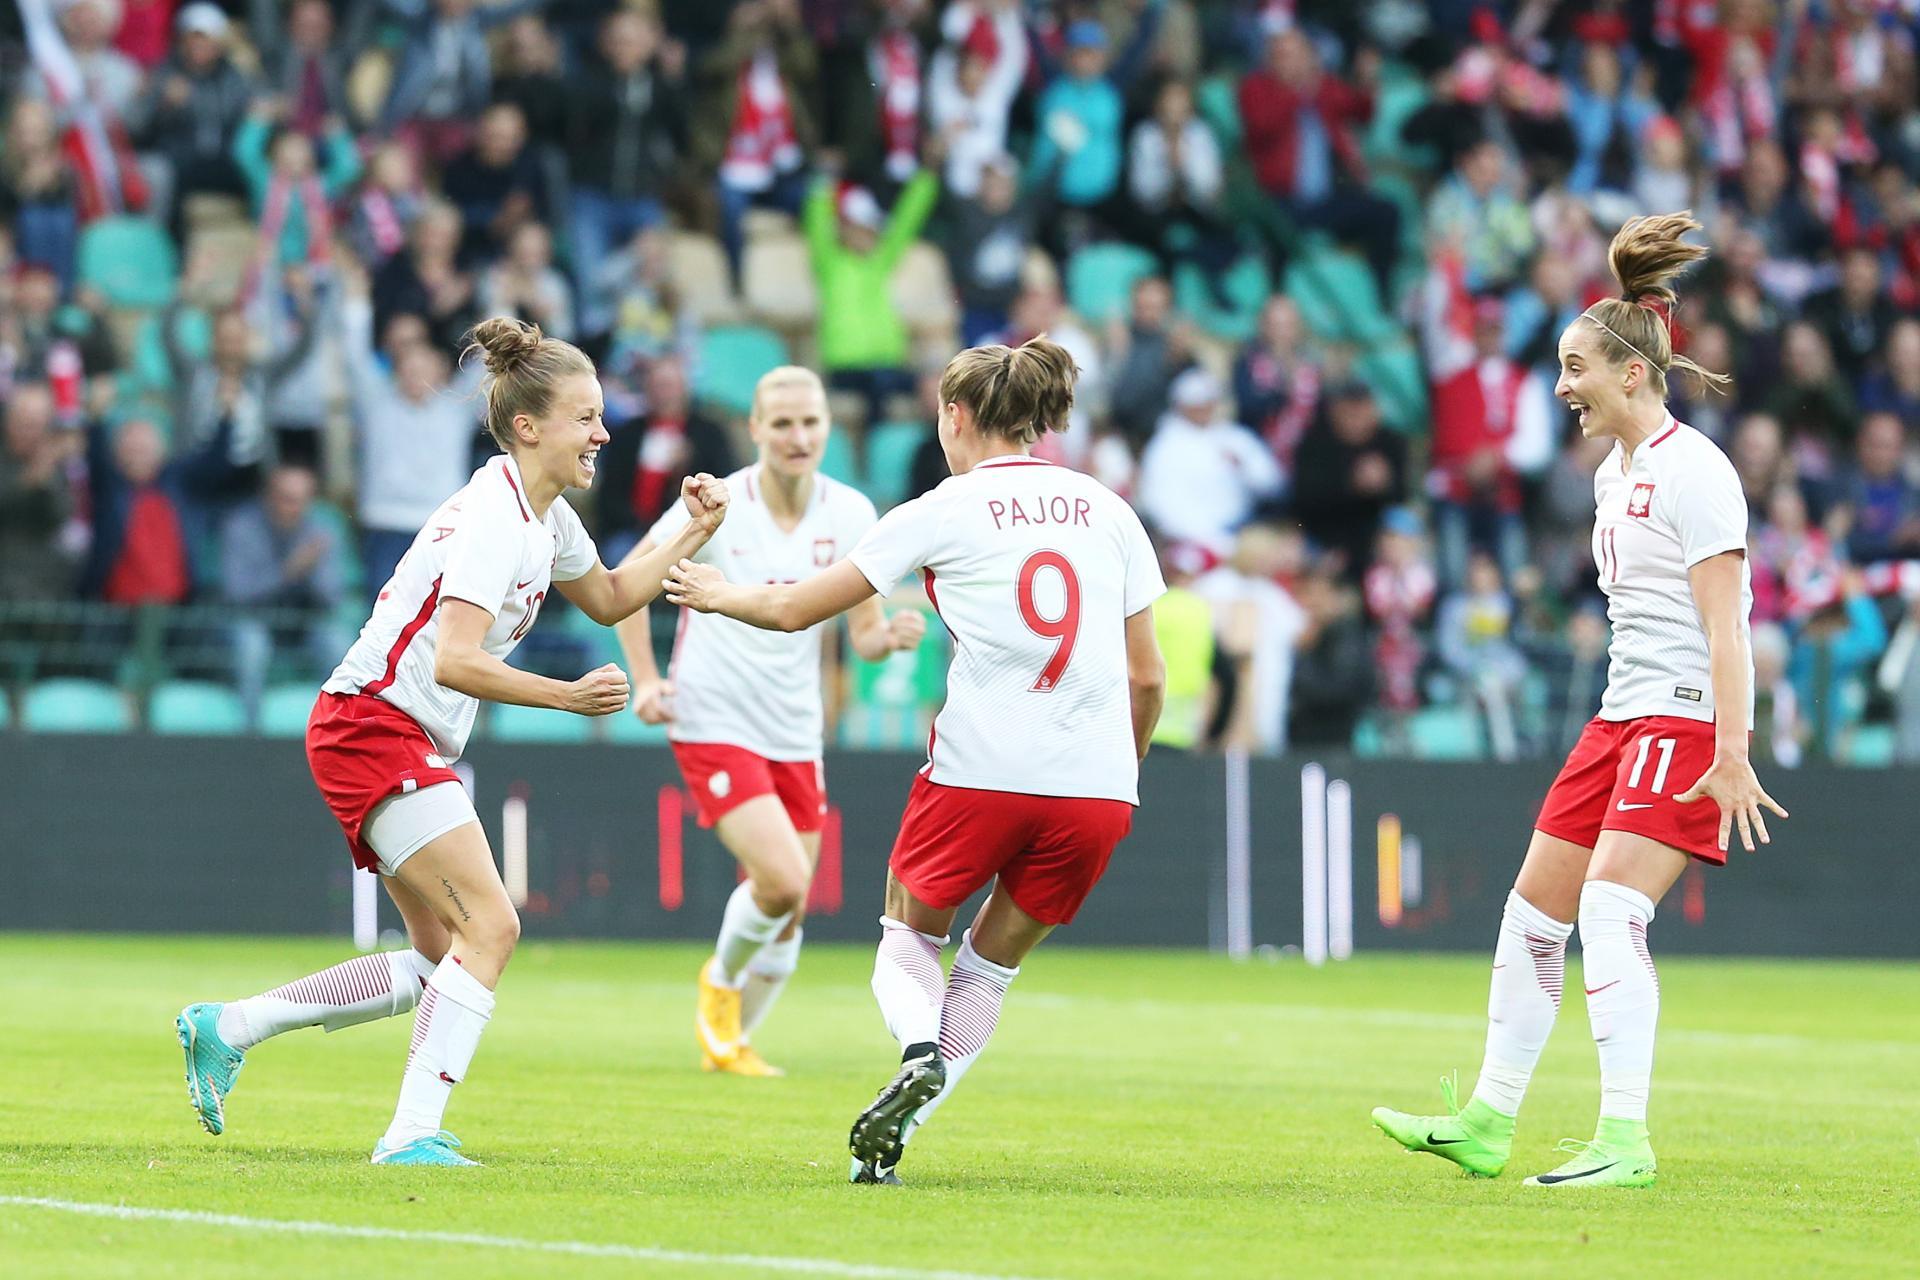 Polska - Białoruś 4:1 kobiet (15.09.2017)